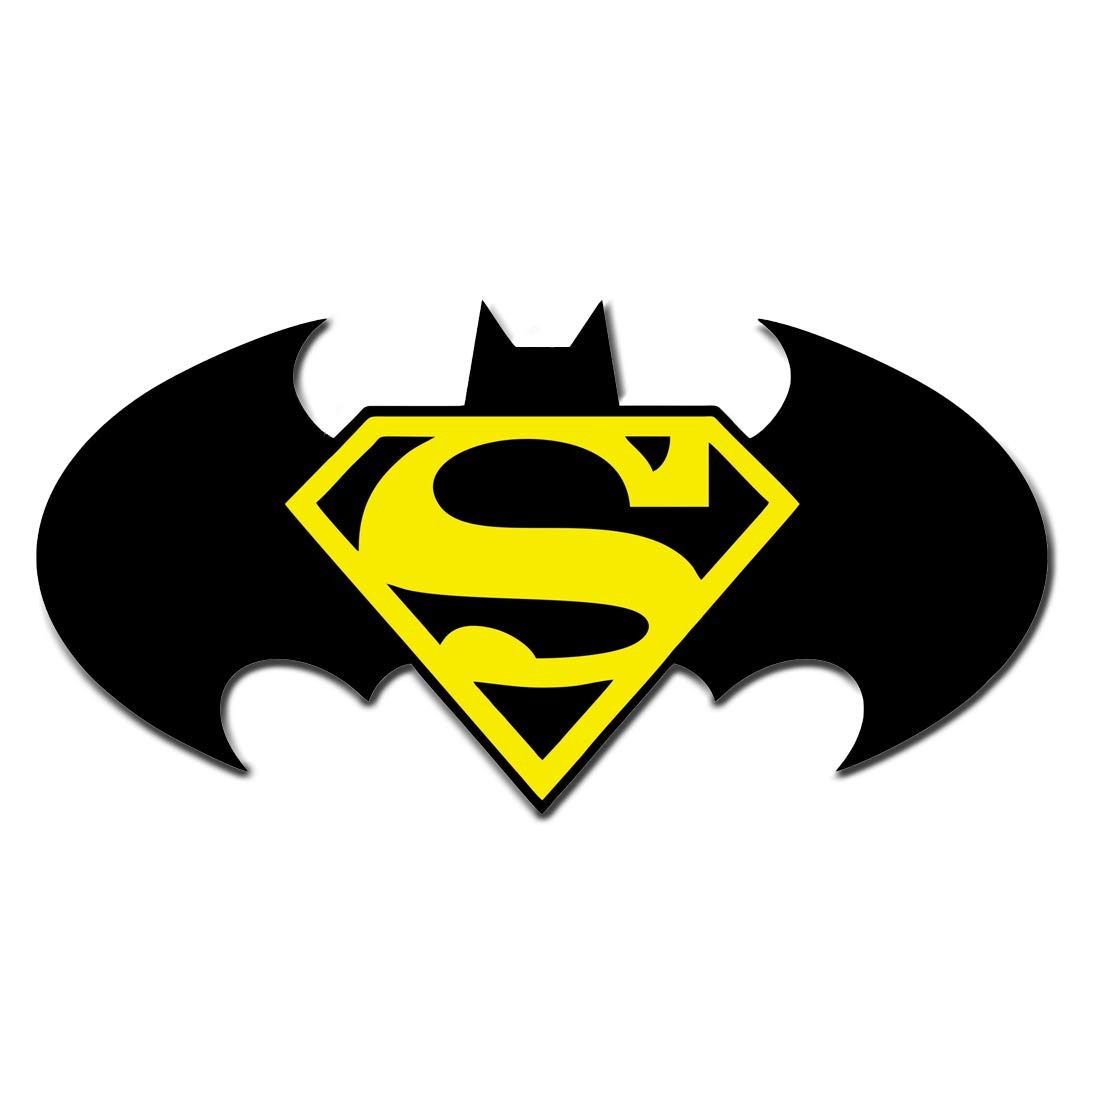 Generic batman superman combined 3d emblem decal acrylic car bike sticker amazon in car motorbike